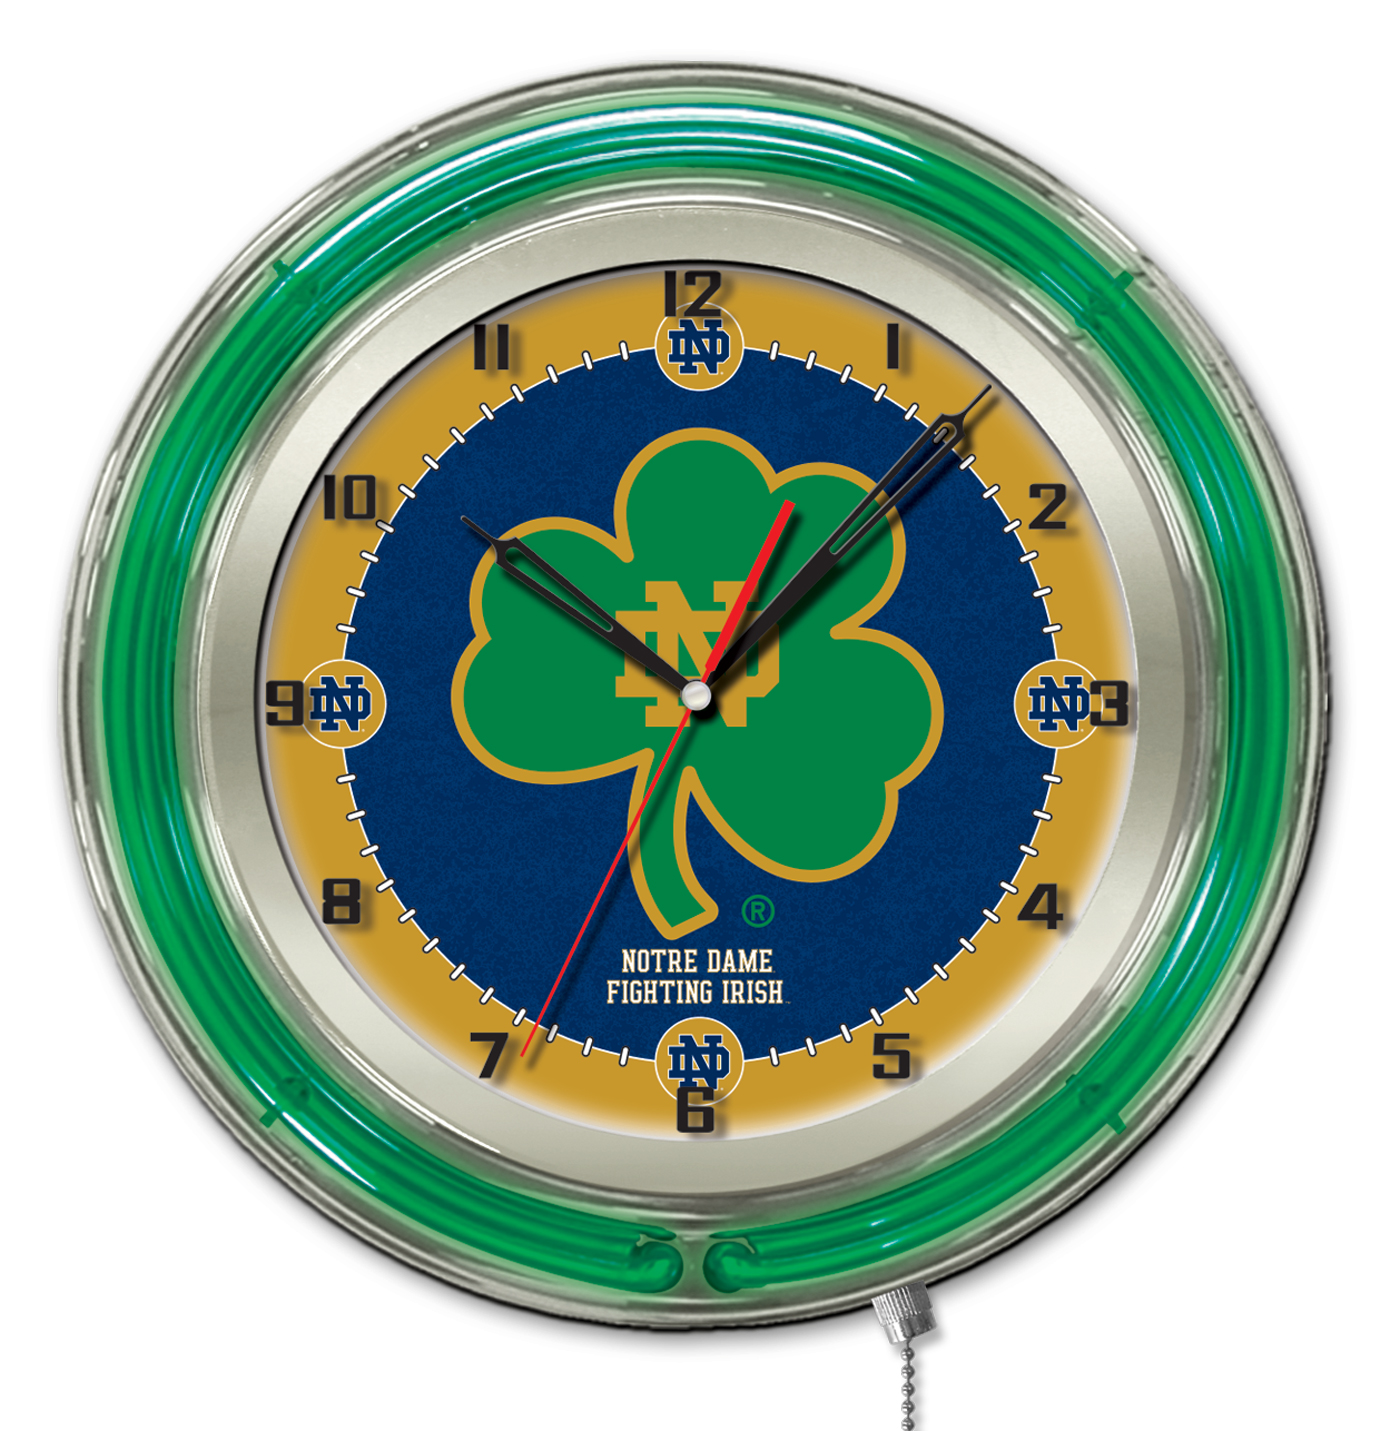 Notre Dame Shamrock Double Neon Ring 19quot dia Logo  : Clk19ND Shm from zerbee.com size 1174 x 1200 jpeg 172kB